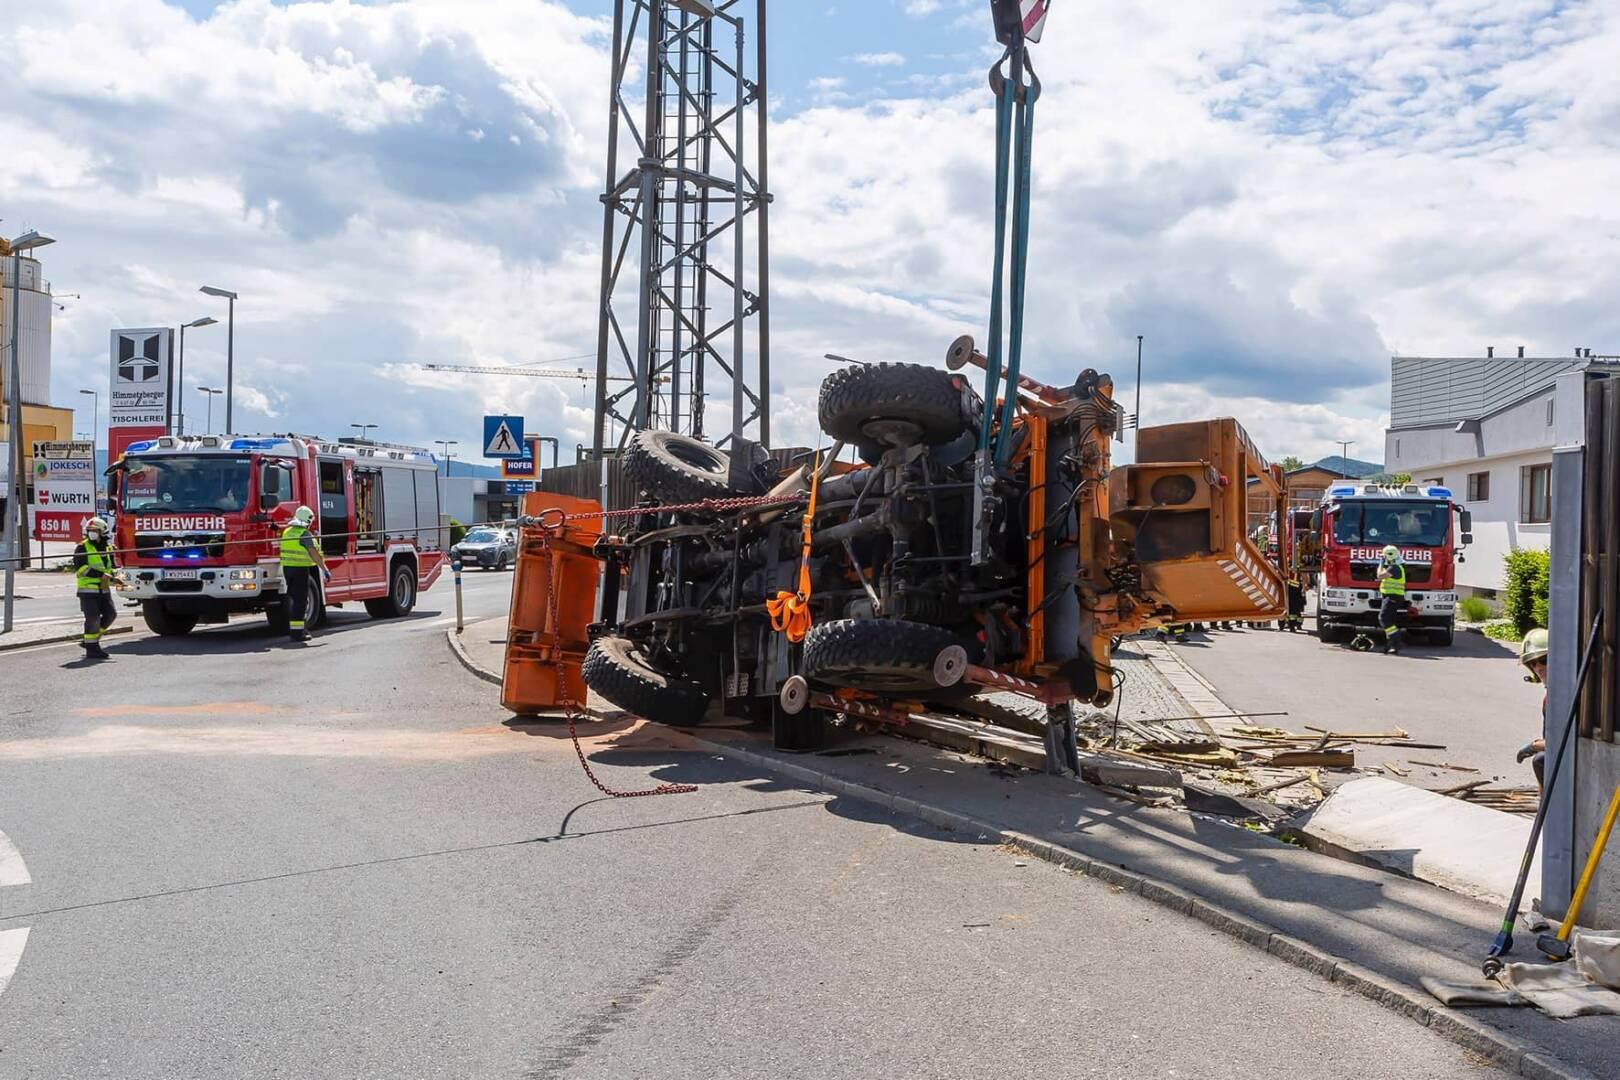 Unimog in Kreisverkehr umgekippt